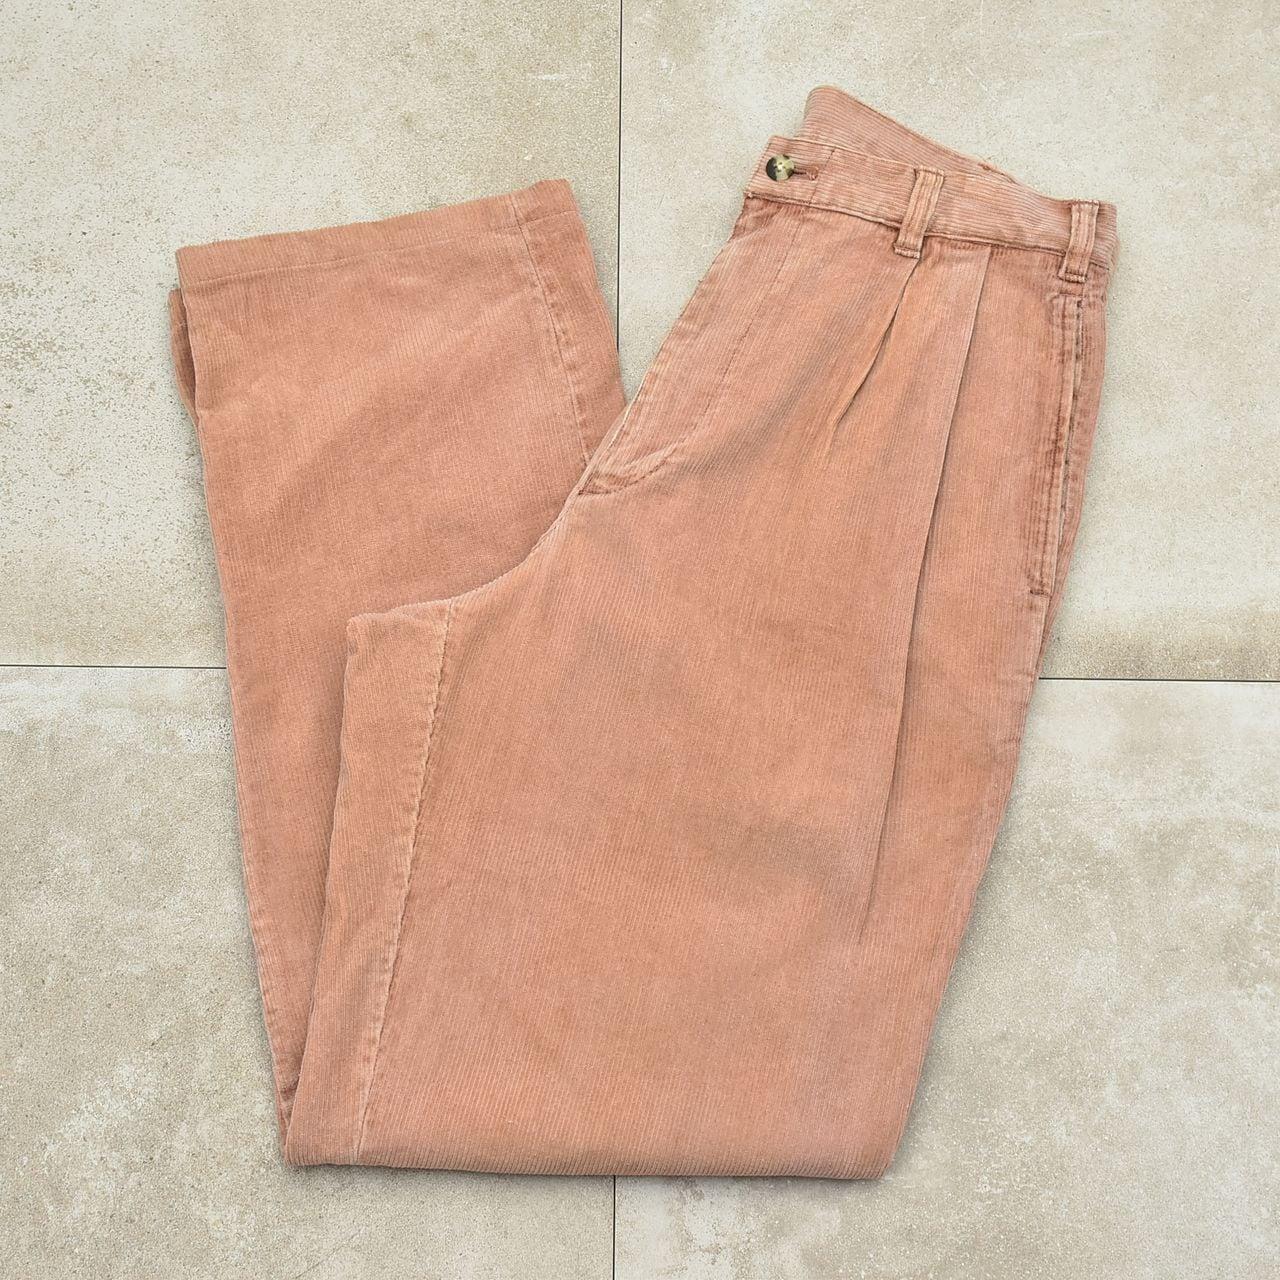 Subdued color 2tuck corduroy pants